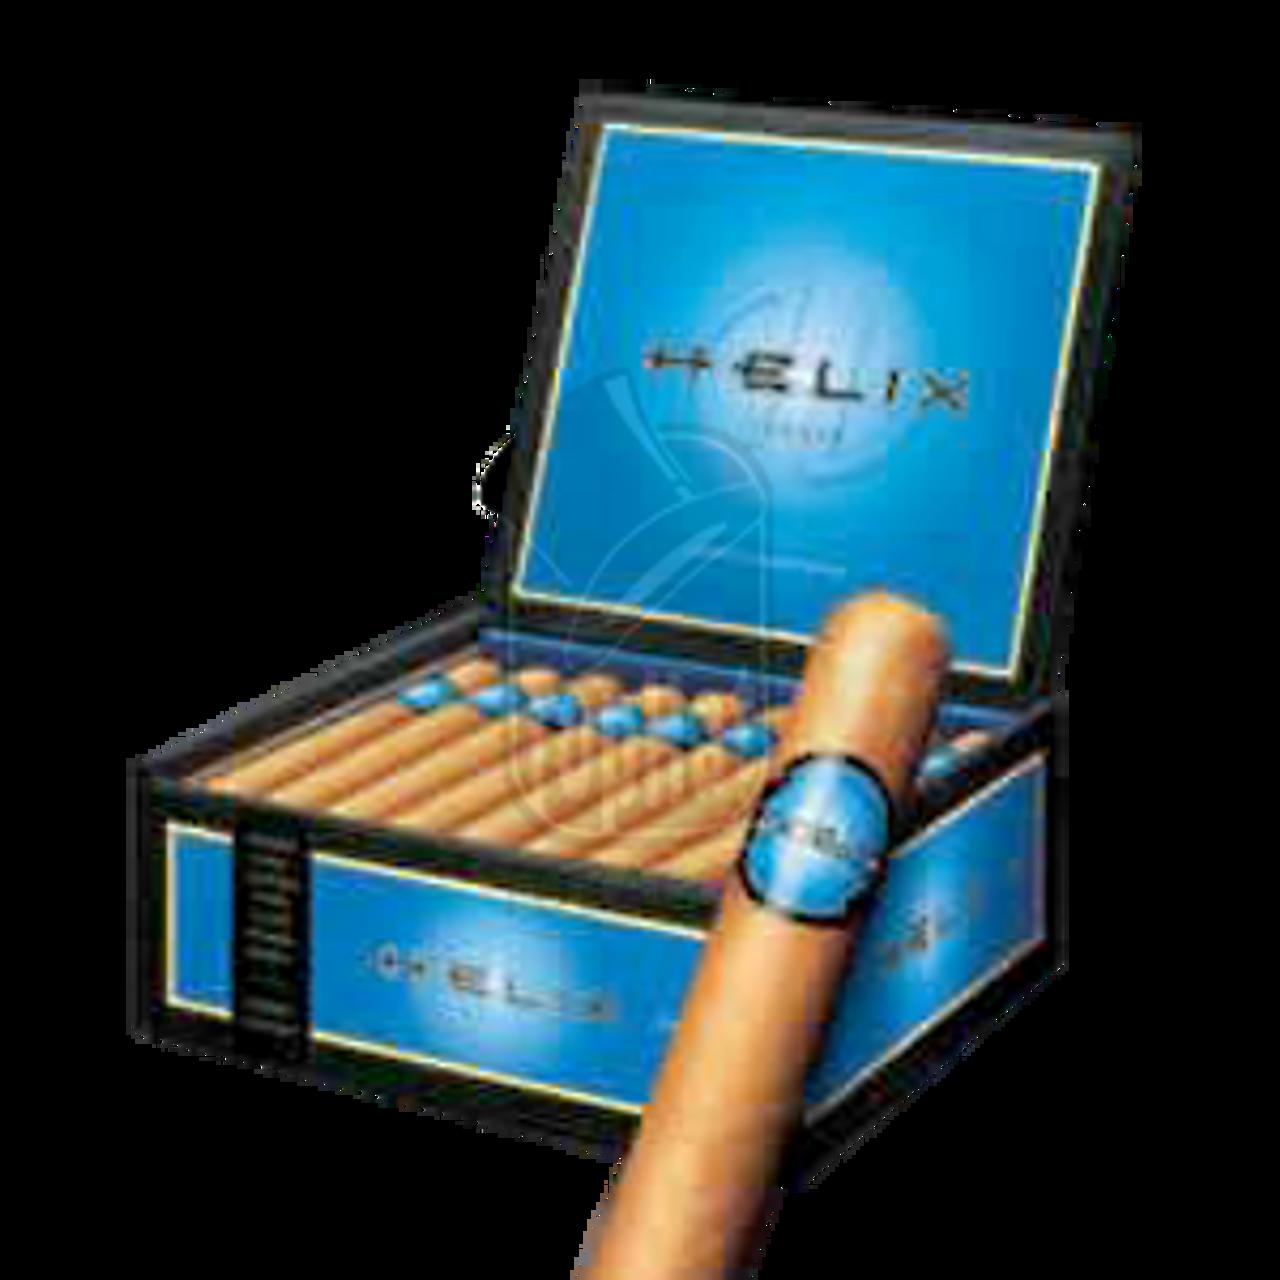 Helix X748 Cigars - 7 x 48 (Box of 25)